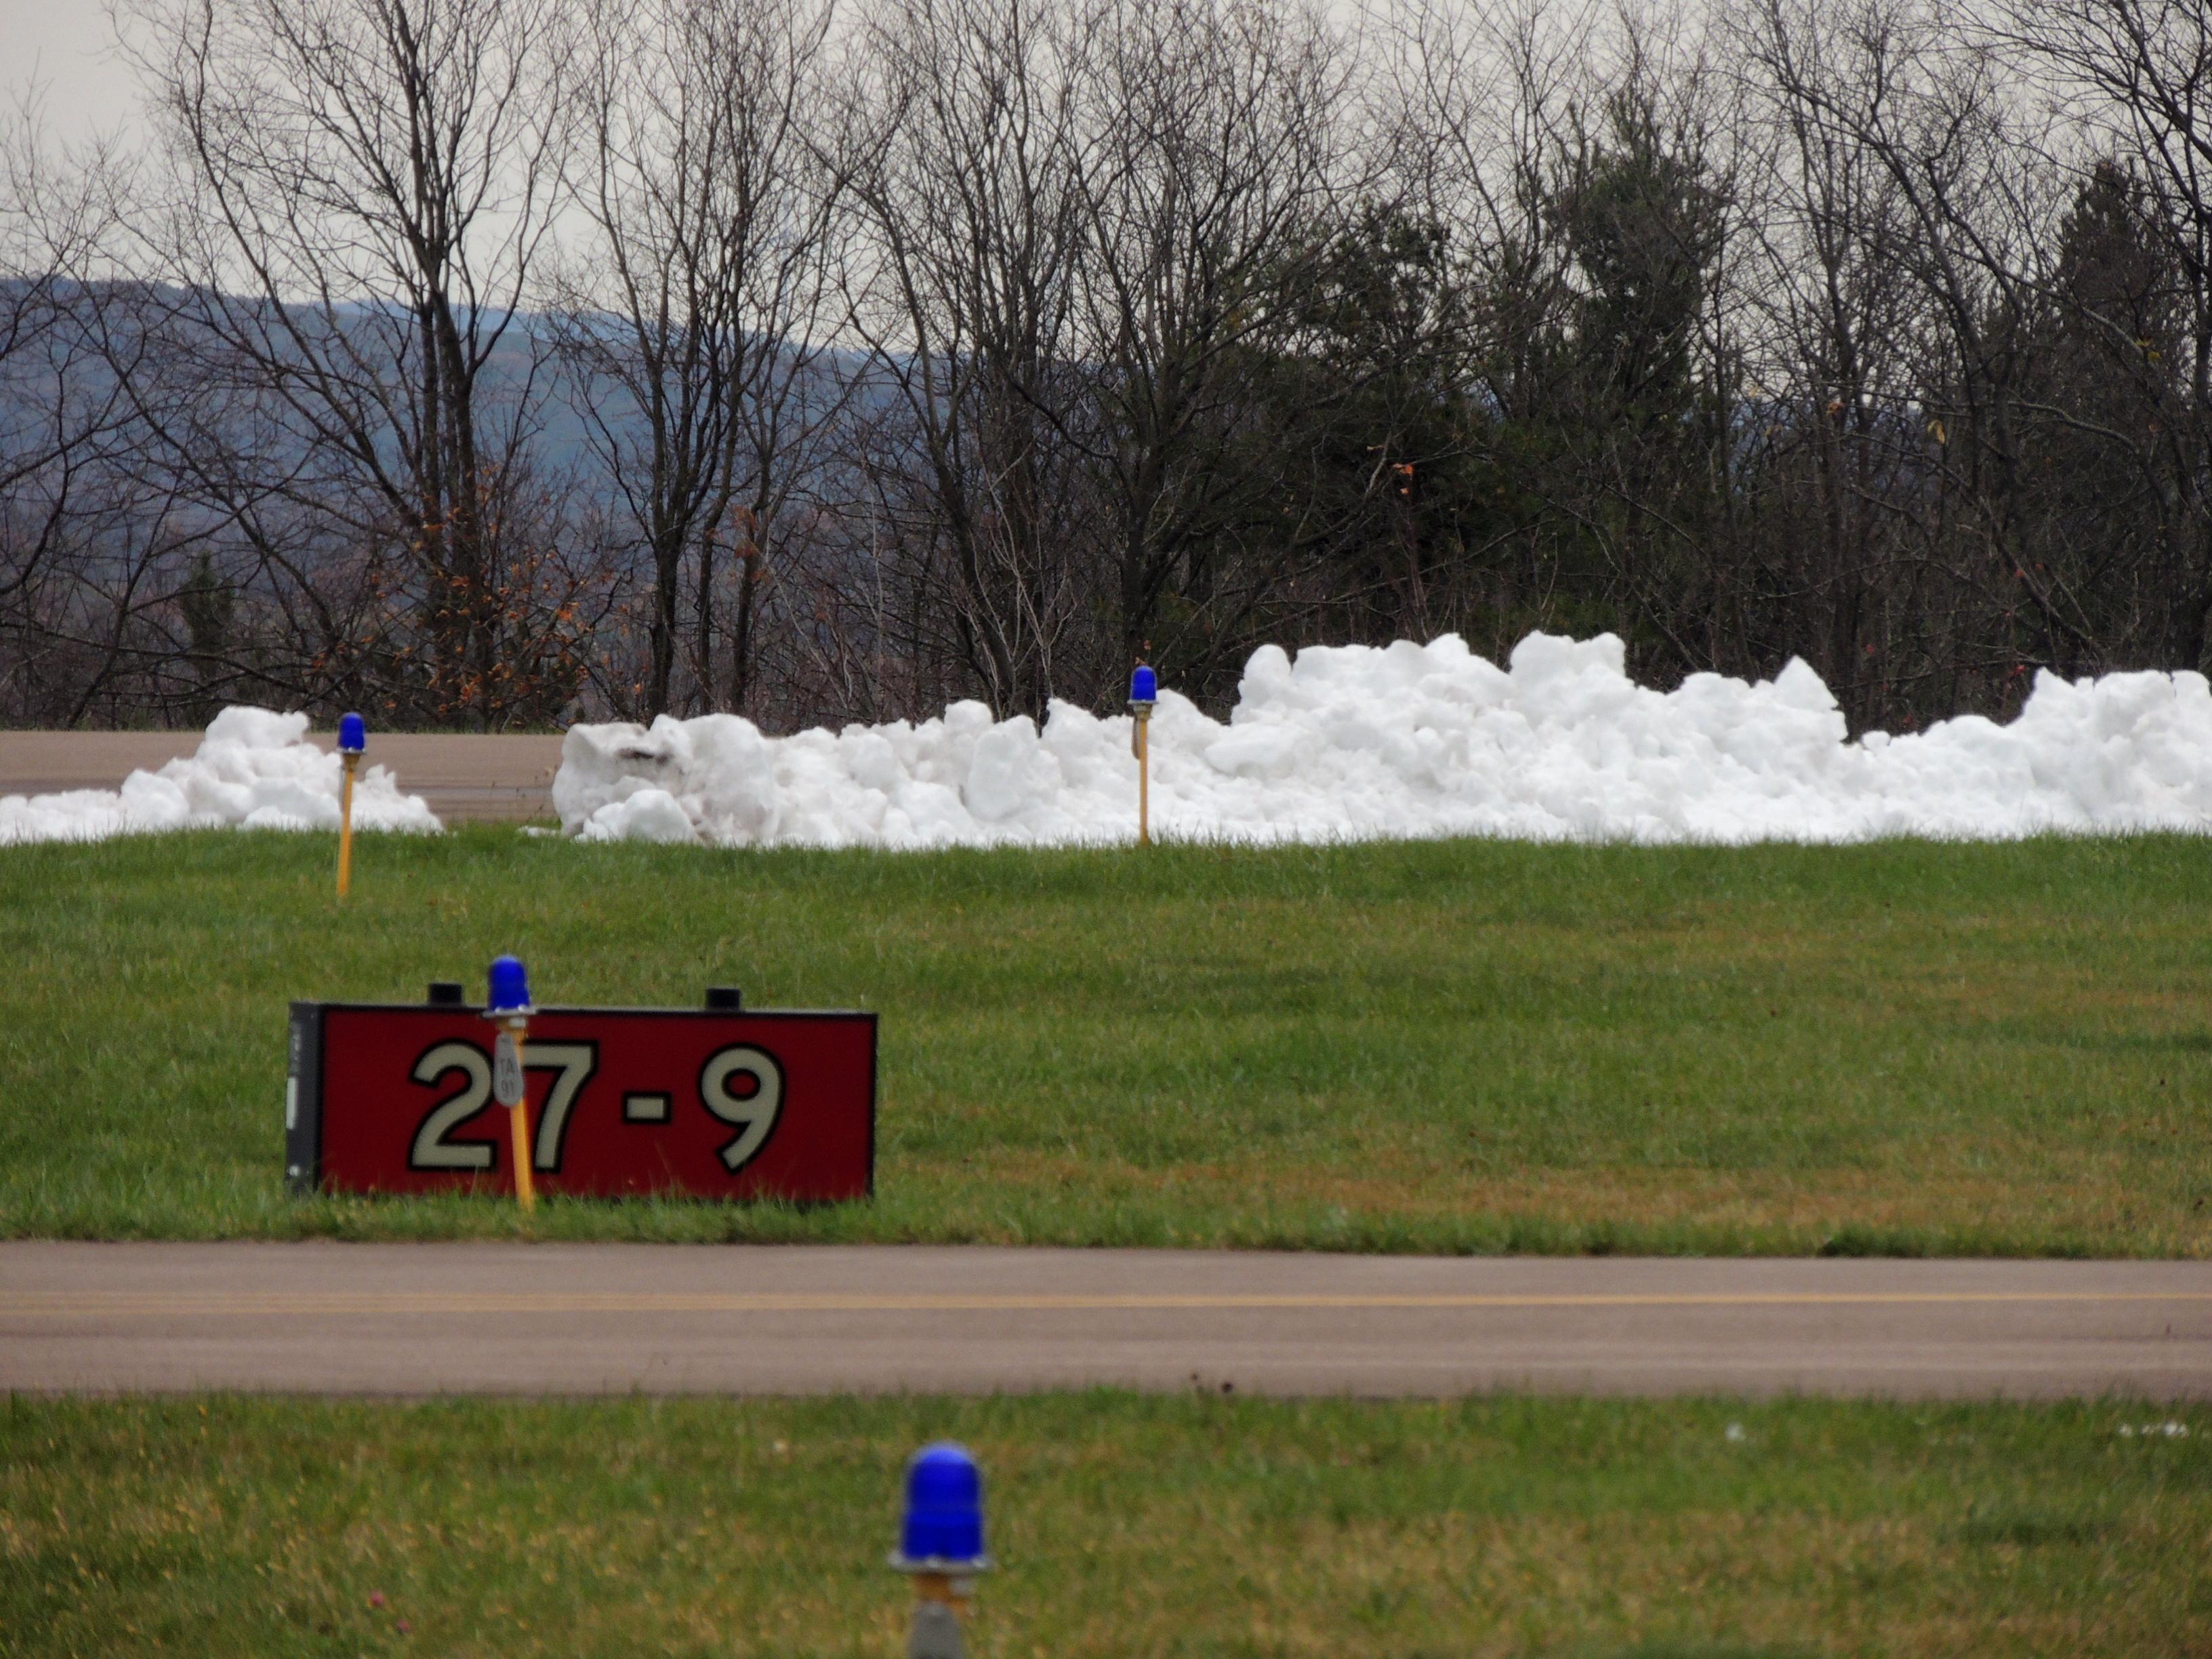 Snow along the runway (Garrett County MD